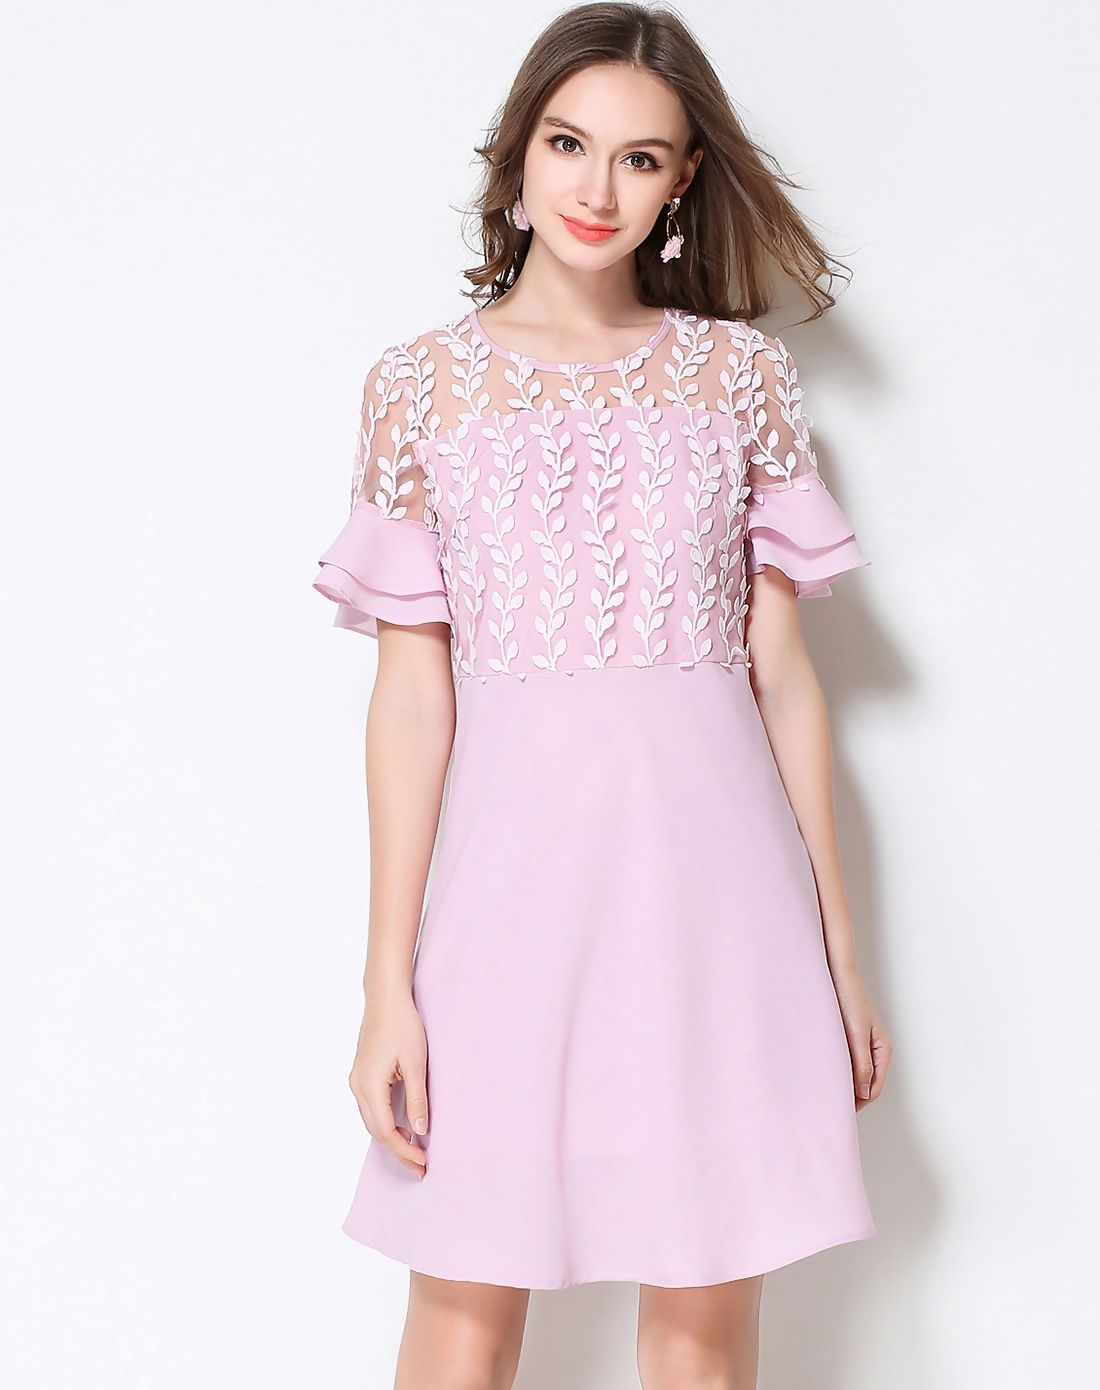 Adorewe vipme aline dressesdesigner meidongtai pink plus size